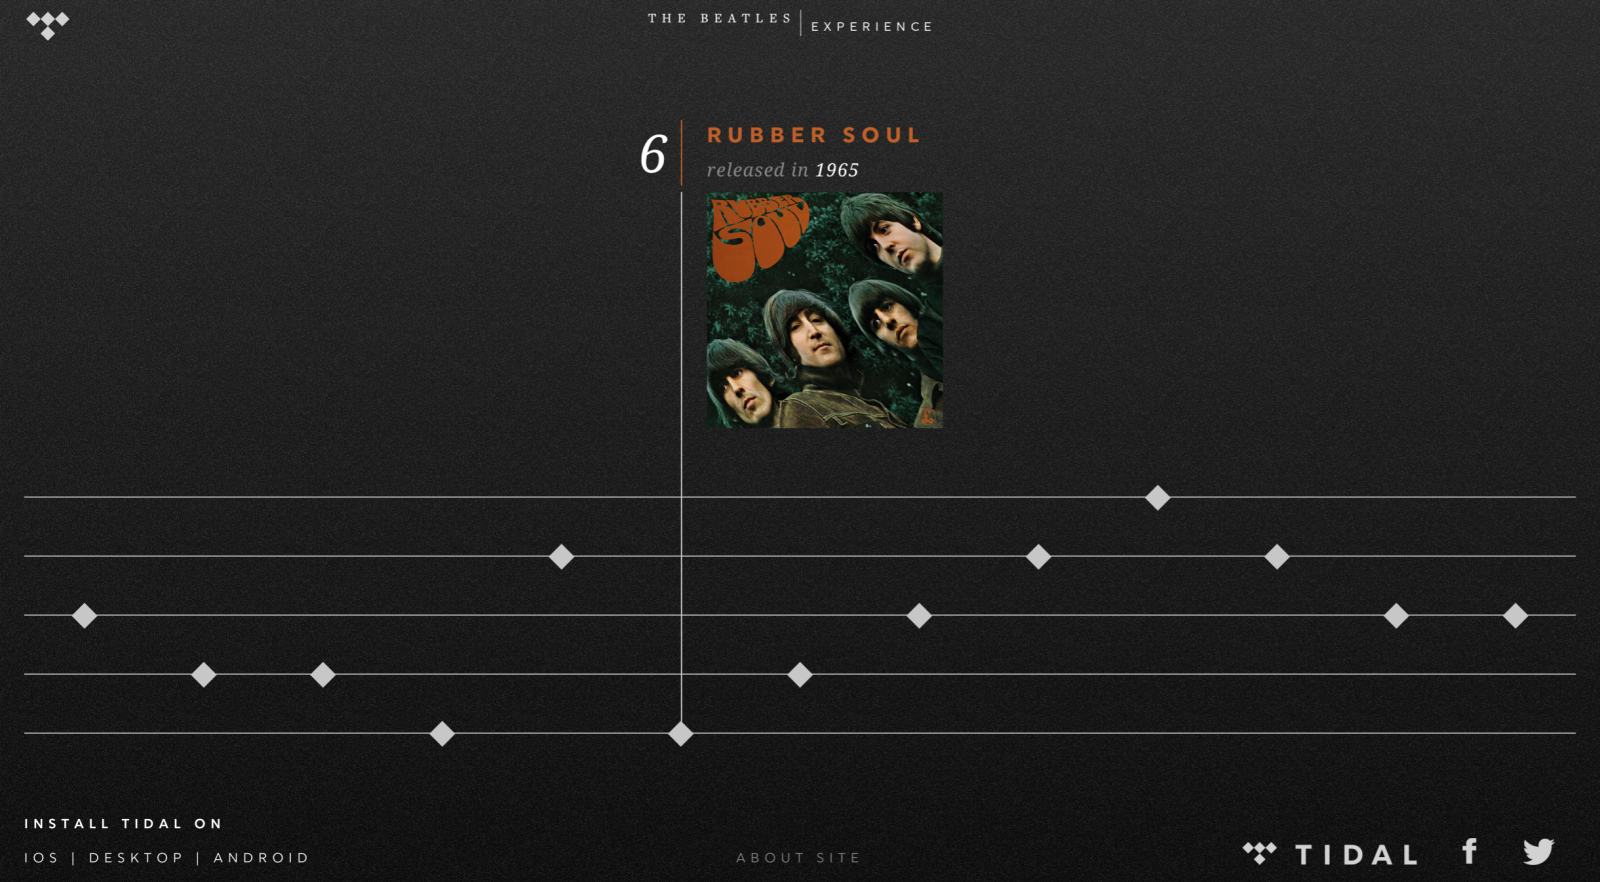 Tidal Beatles Experience